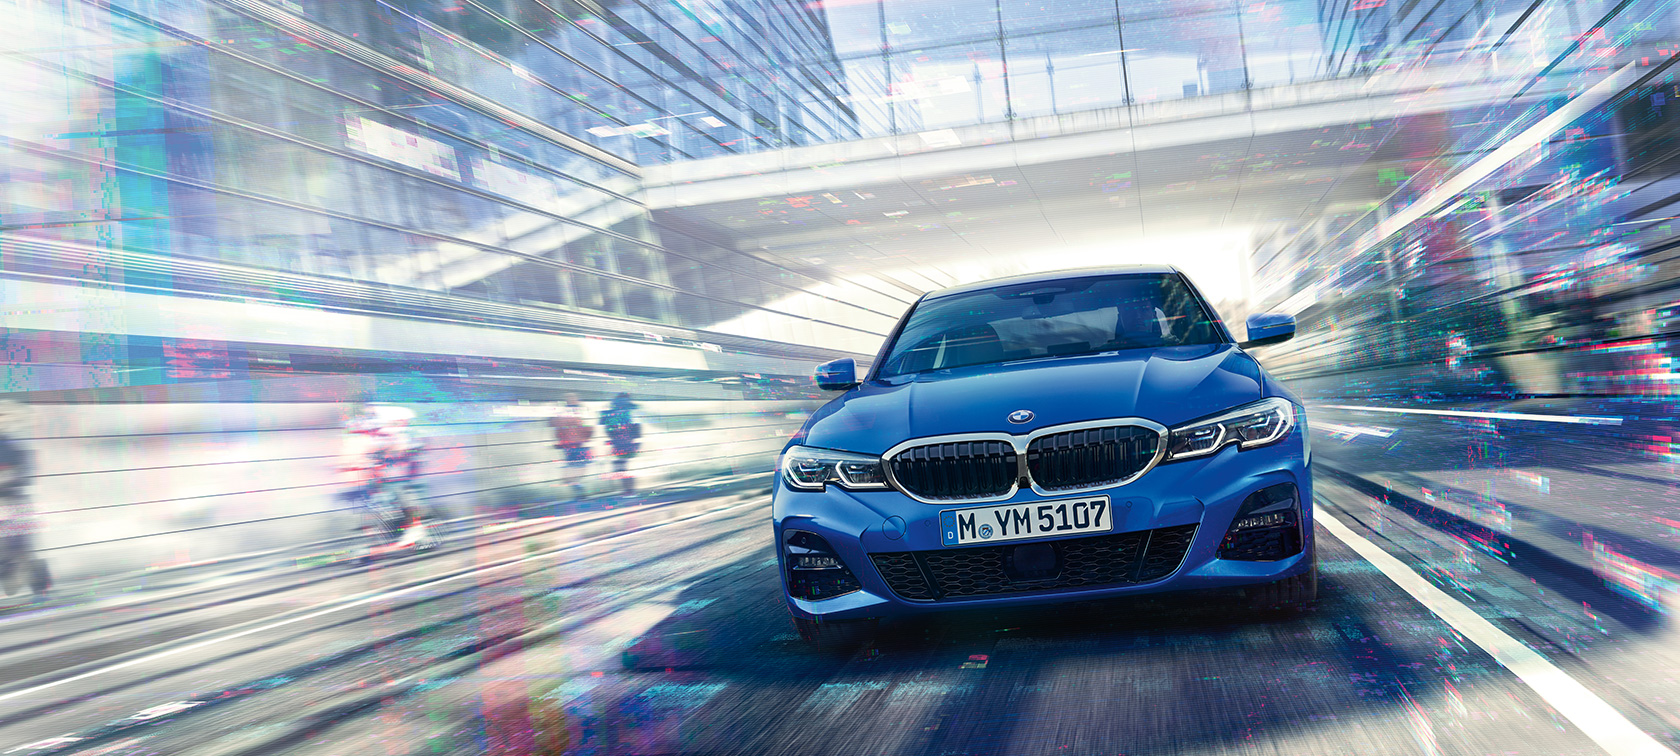 BMW 3 Series Sedan: the ultimate sports sedan | bmw com bn